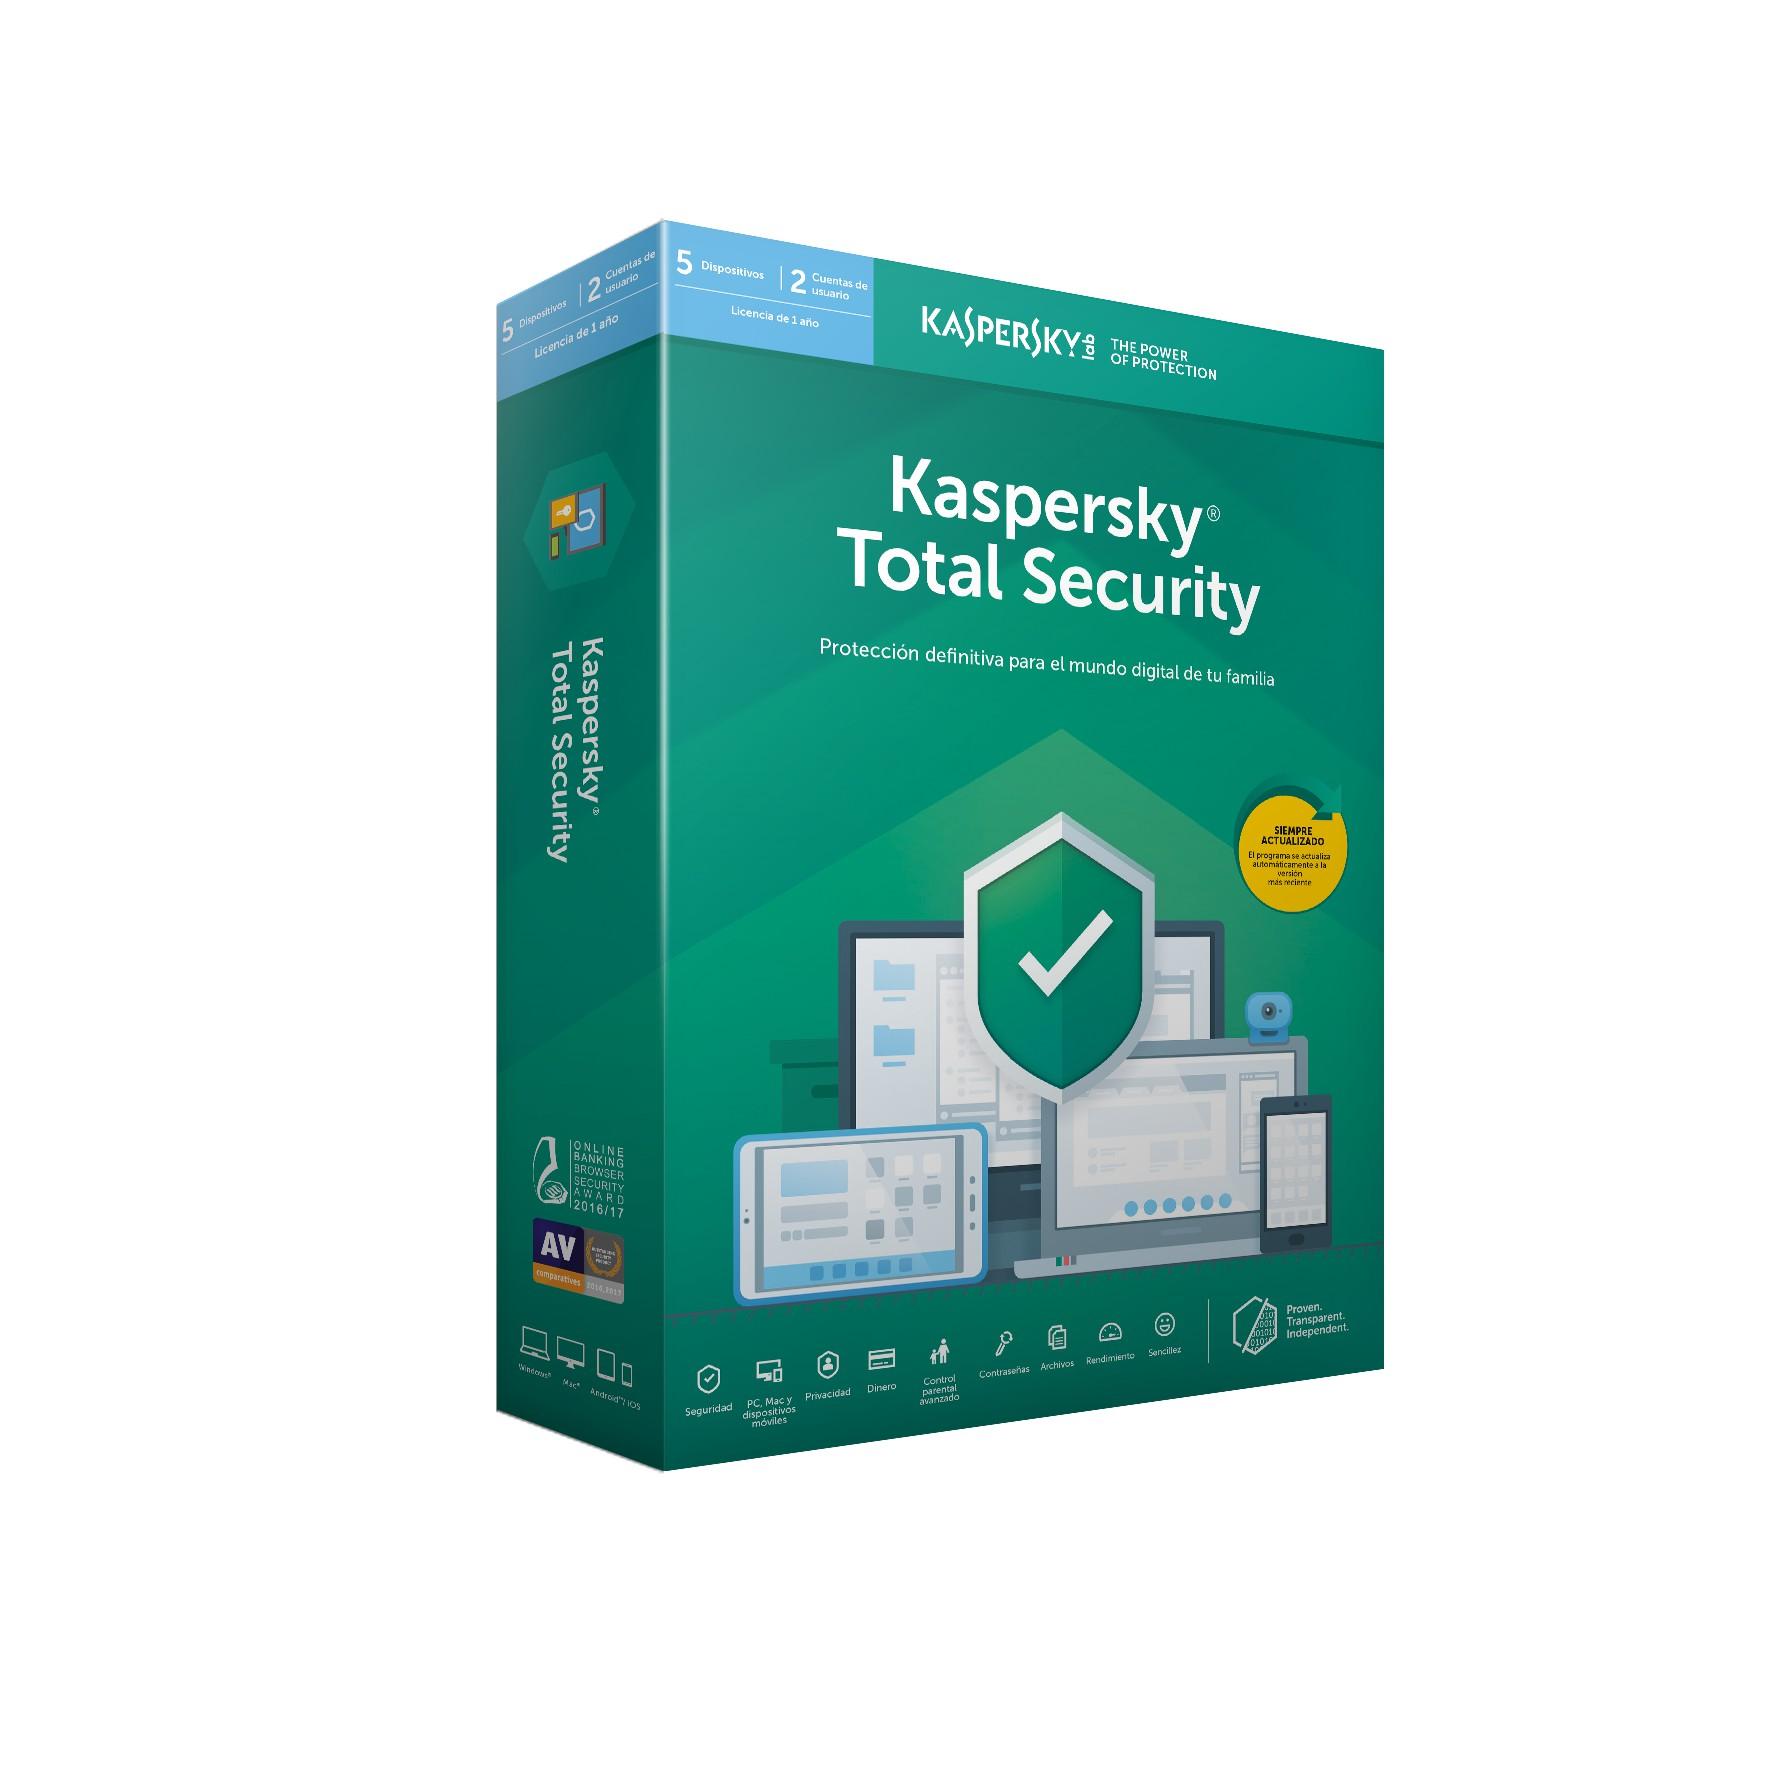 SOFTWARE ANTIVIRUS KASPERSKY 2019 TOTAL SECURITY 5 LICENCIAS EDICION LIMITADA